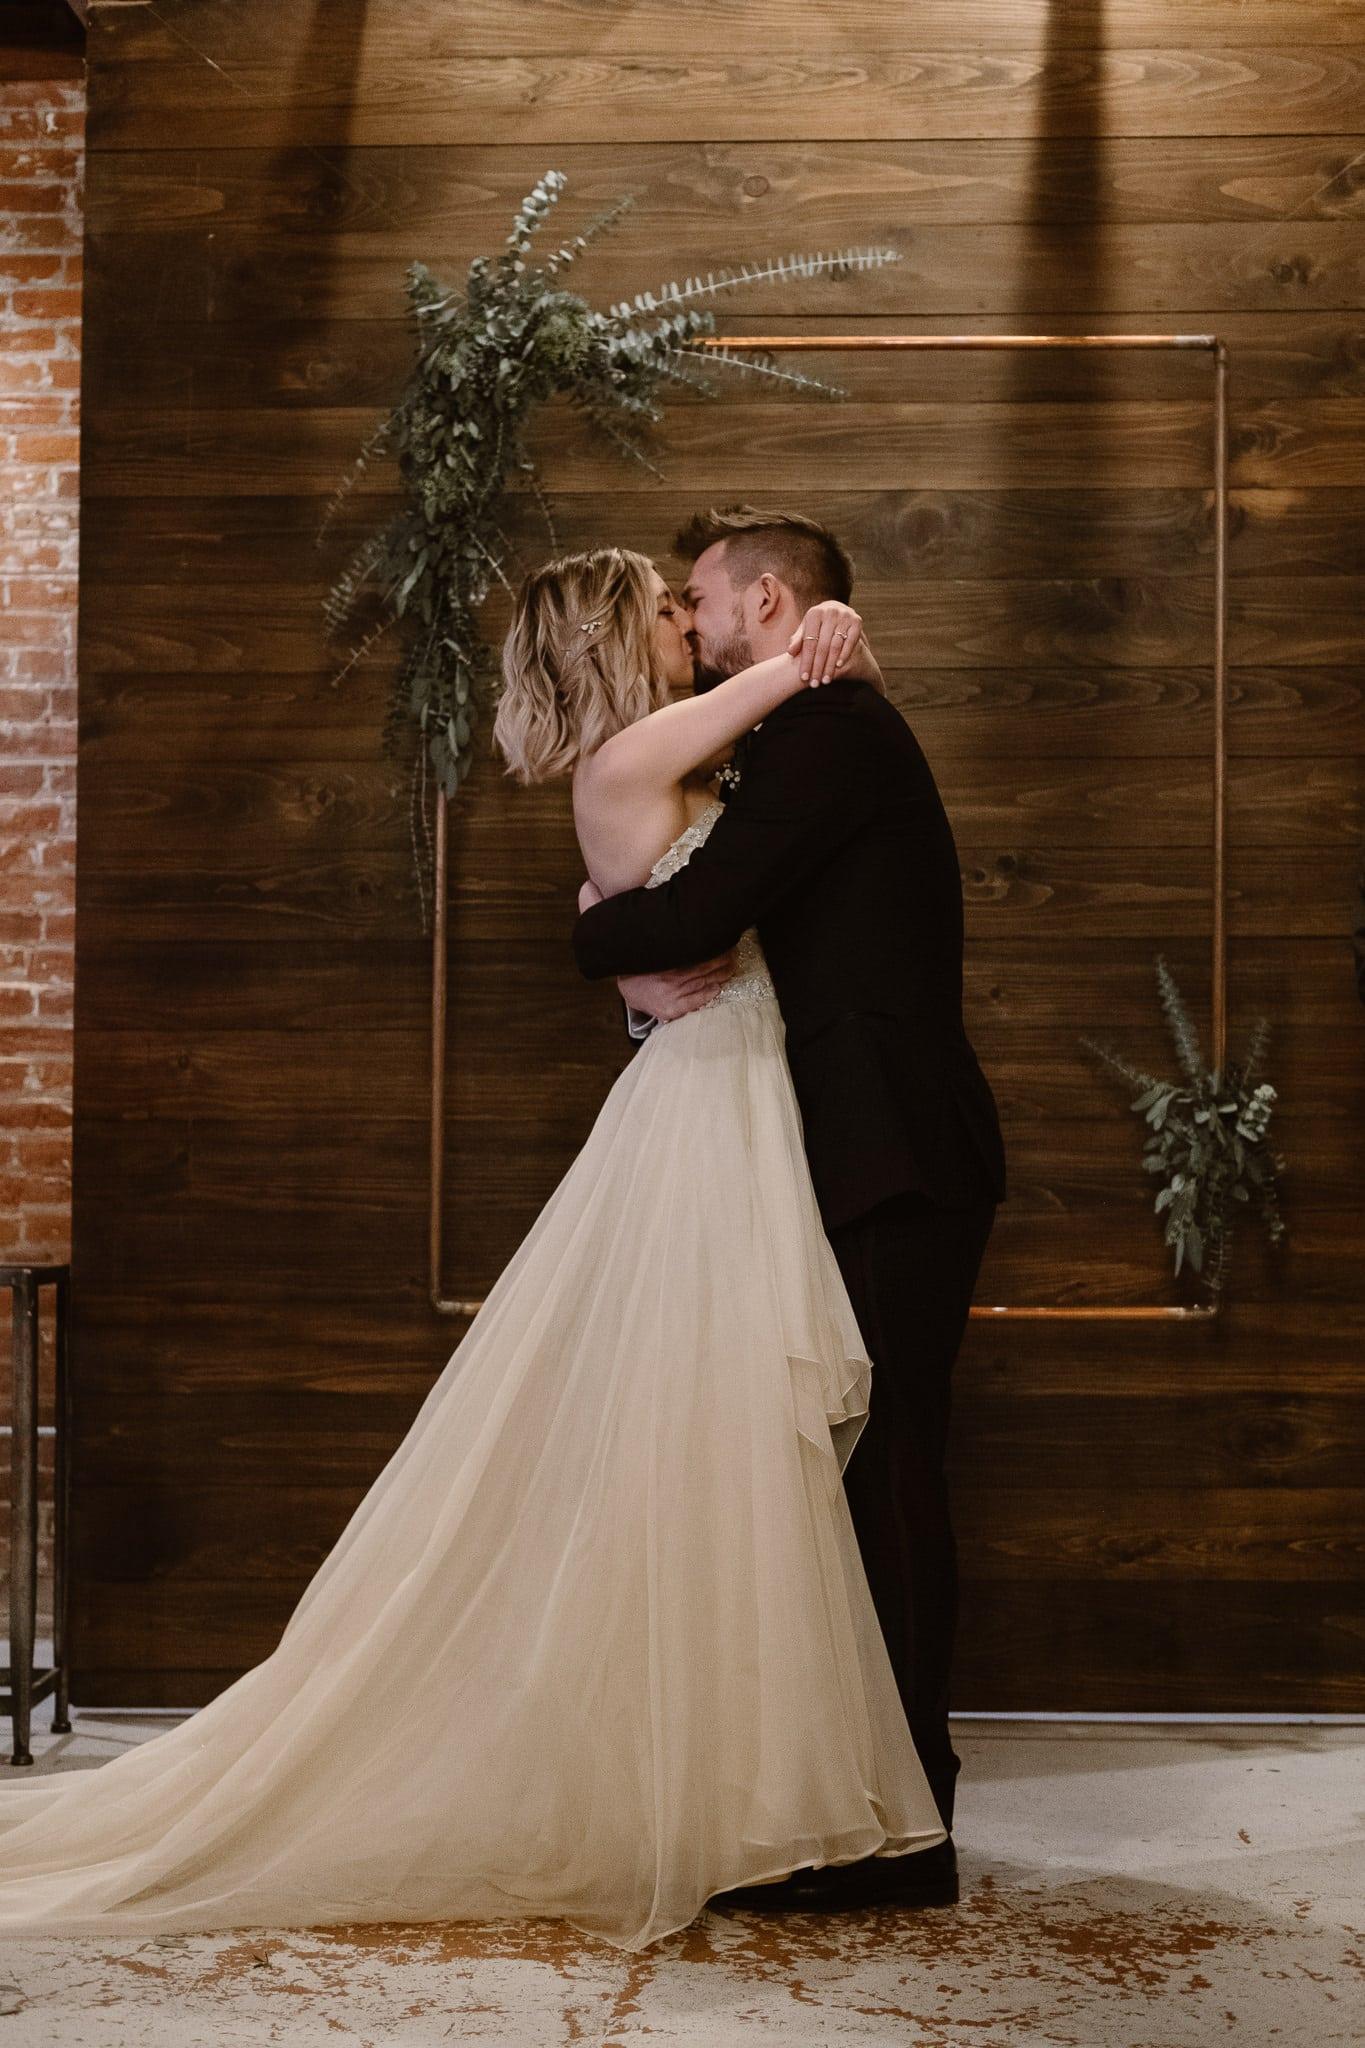 St Vrain Wedding Photographer | Longmont Wedding Photographer | Colorado Winter Wedding Photographer, Colorado industrial chic wedding ceremony, first kiss